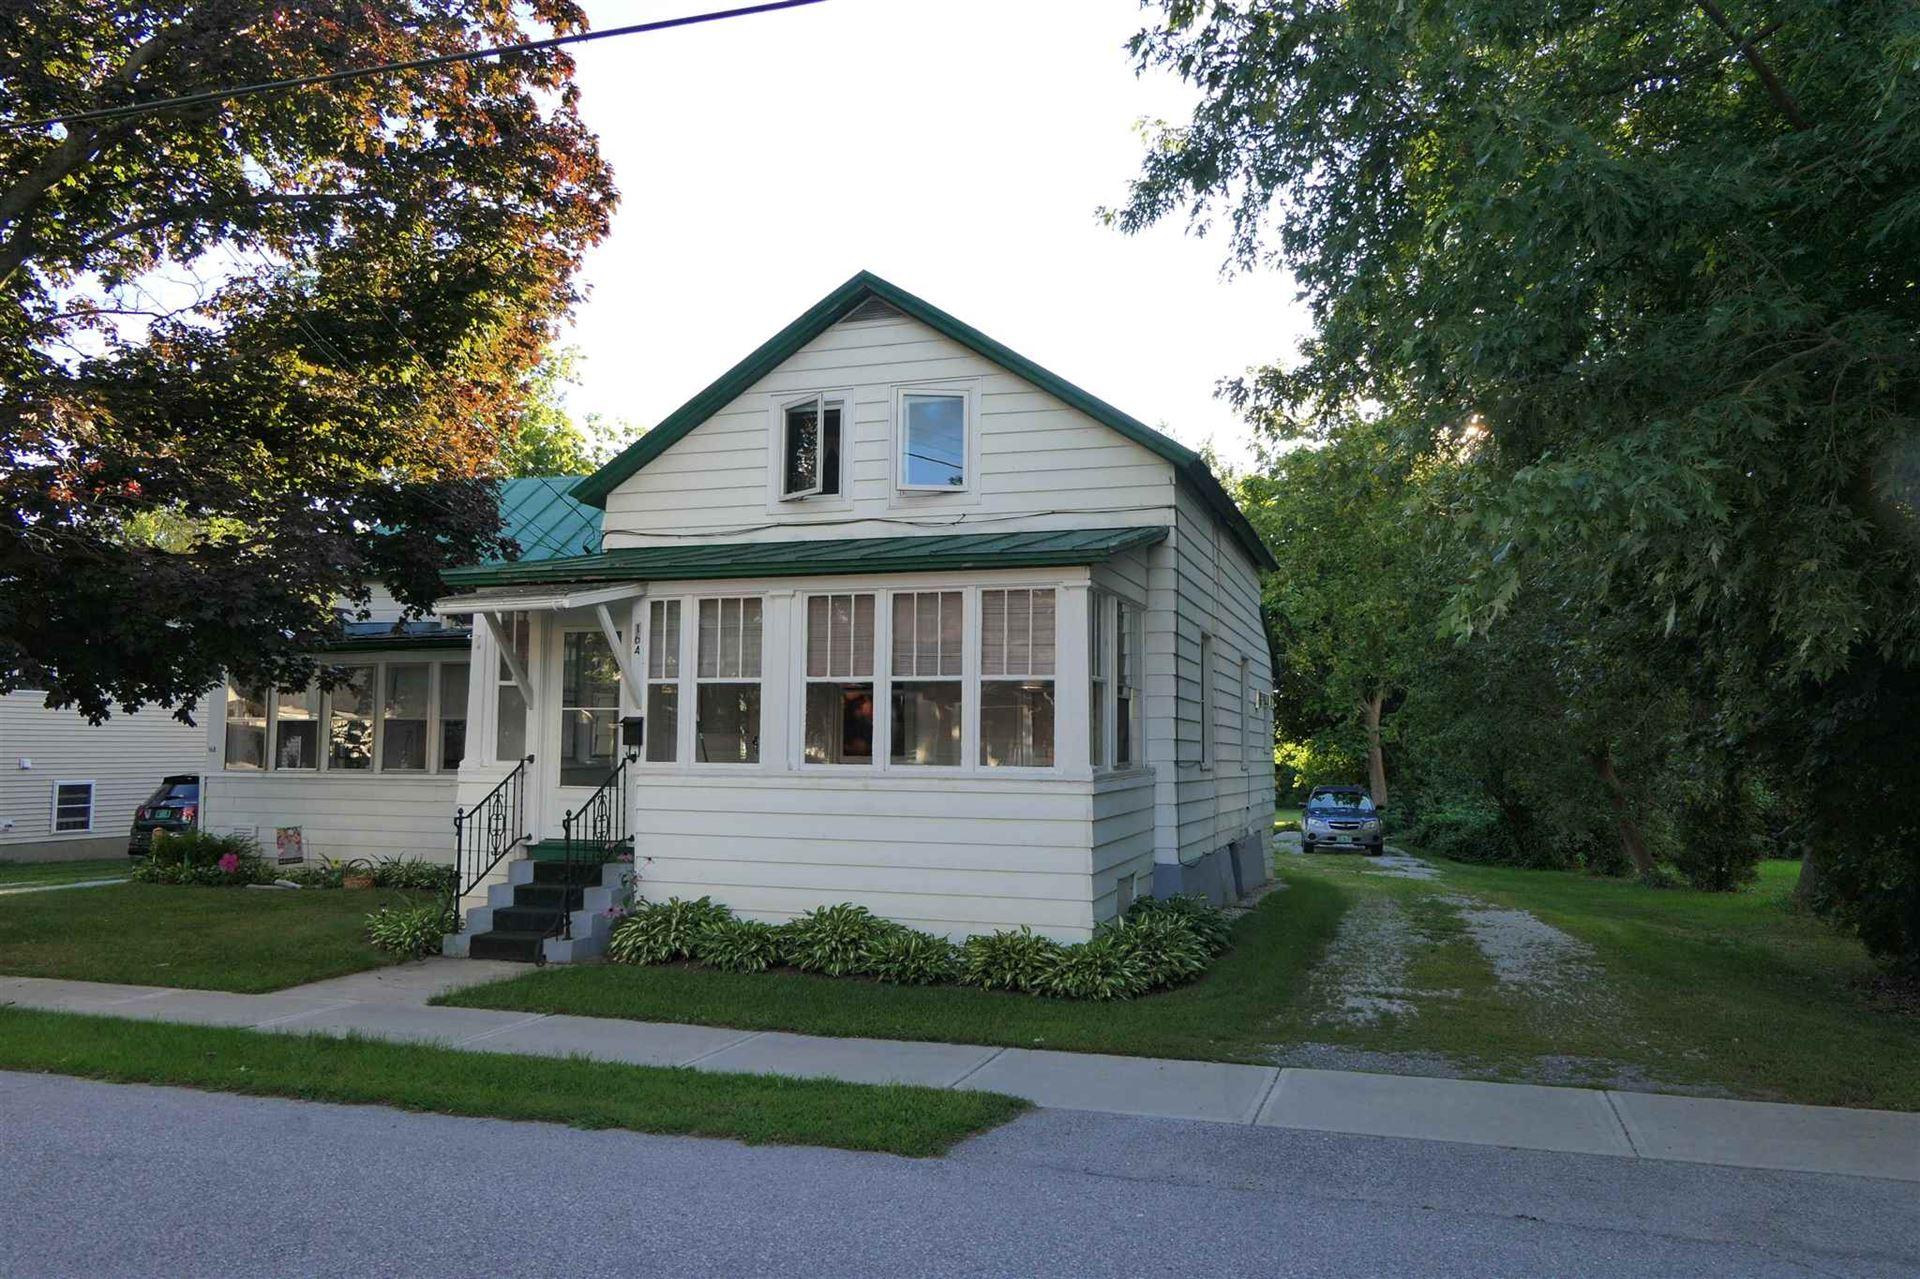 16 Huntington Street, Saint Albans, VT 05478 - MLS#: 4825746